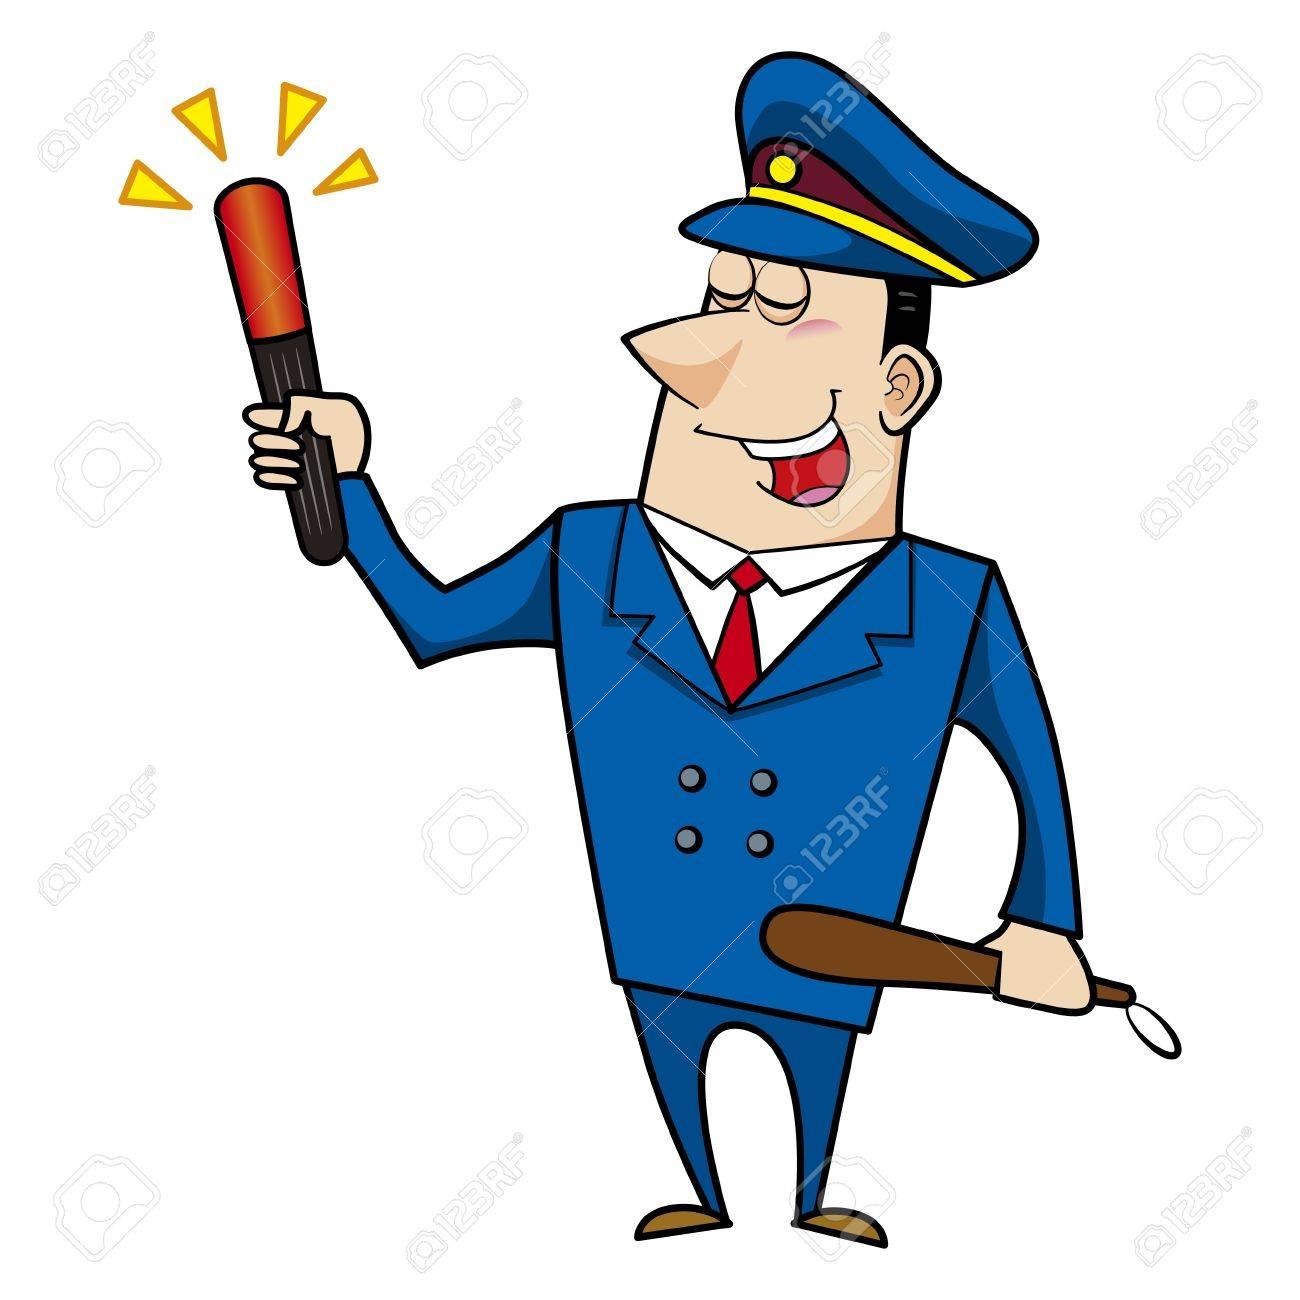 male cartoon police officer Stock Vector - 18107628